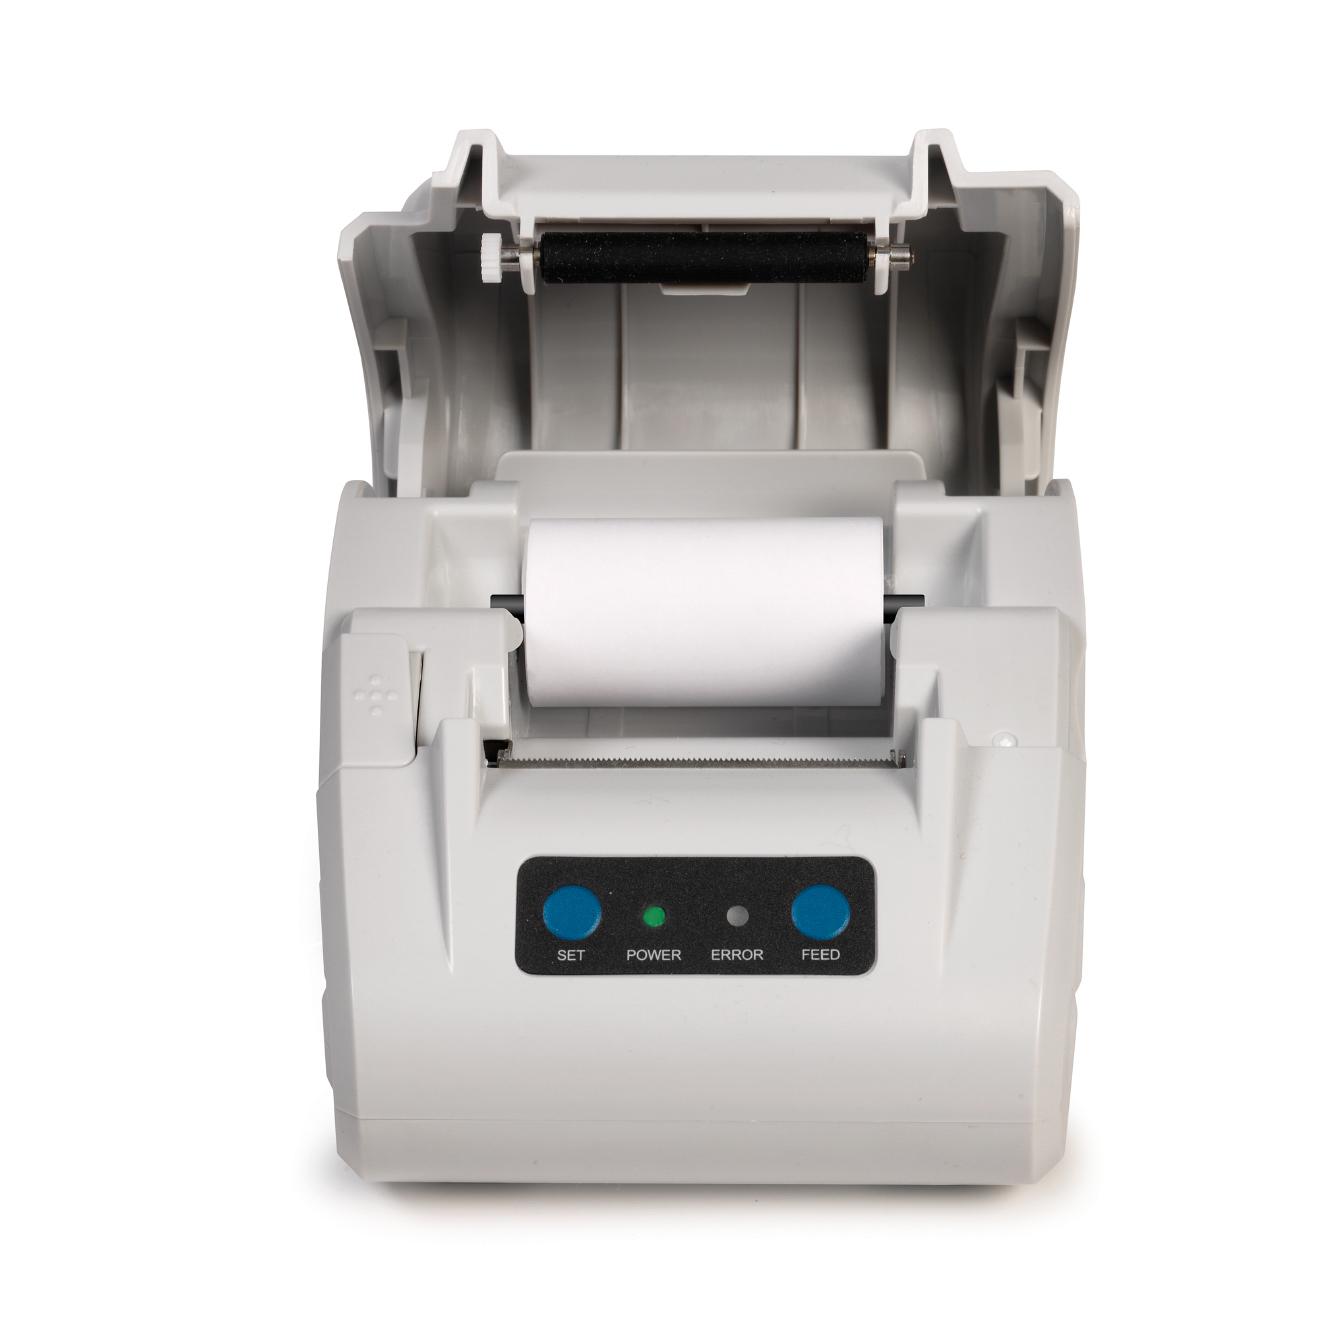 Safescan TP-230 Thermal Receipt Printer 0.375kg L200xW138xH120mm Light Grey Ref 134-0475